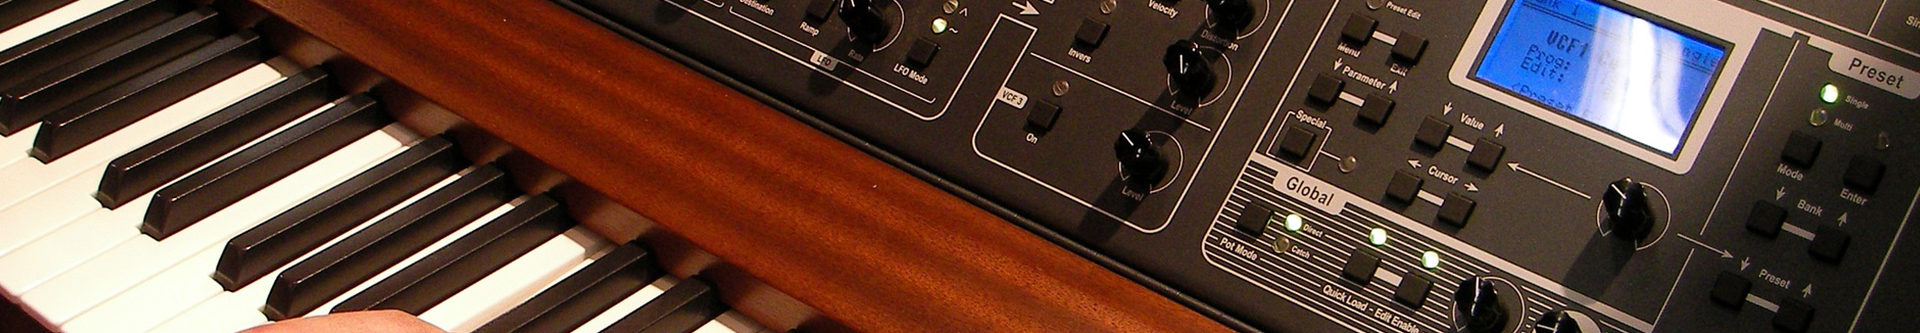 synth soundfonts